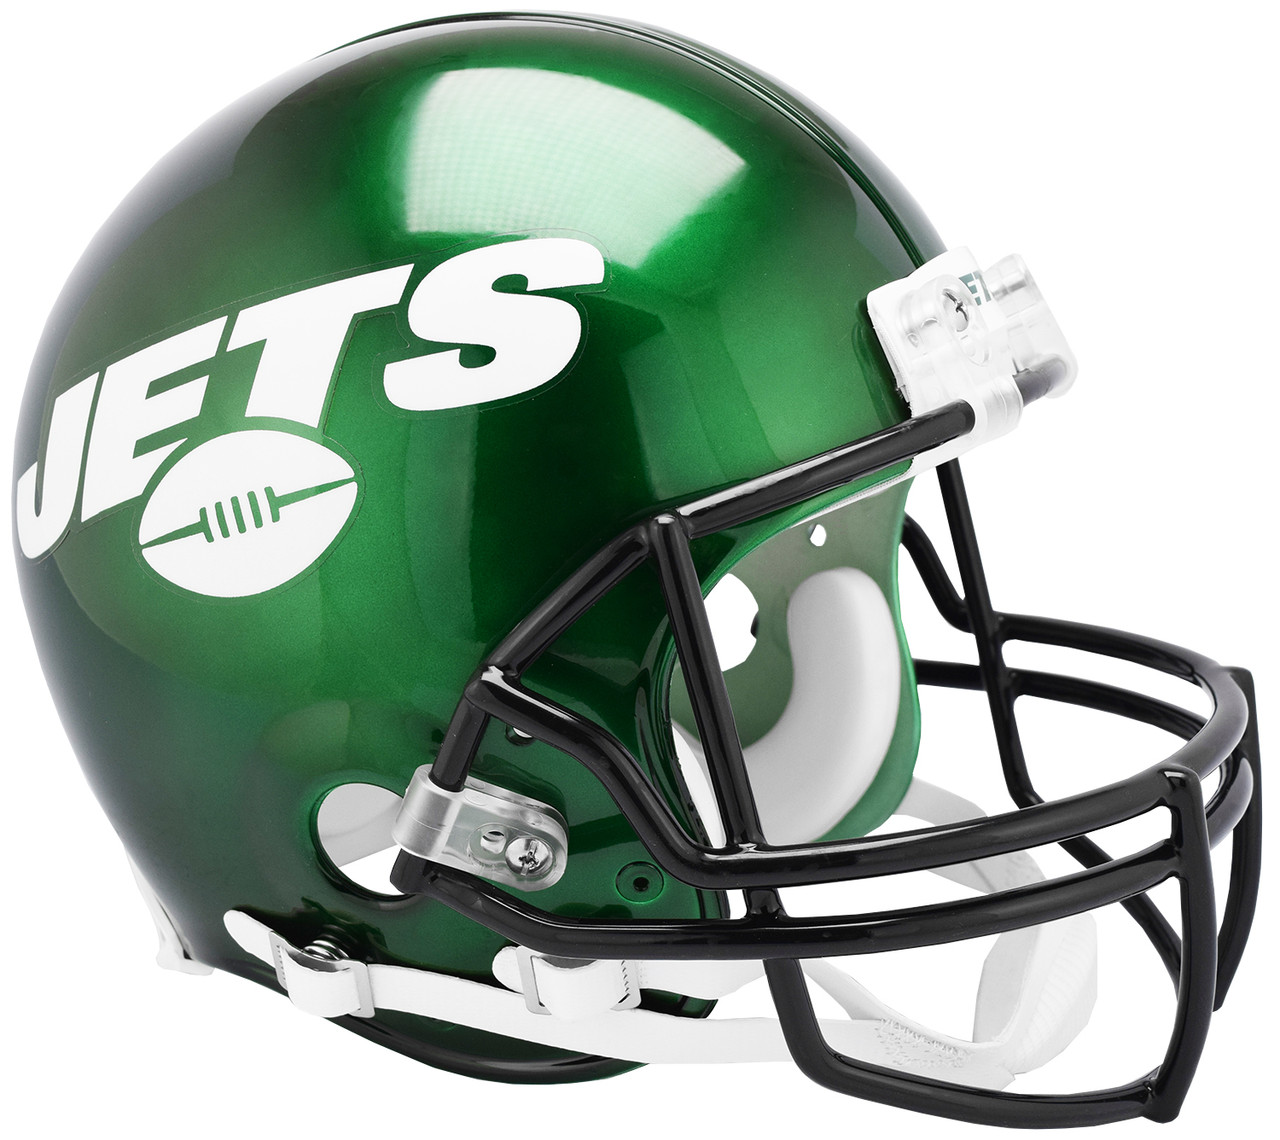 fb71f300 New York Jets 2019 Riddell Full Size Authentic Proline Football Helmet